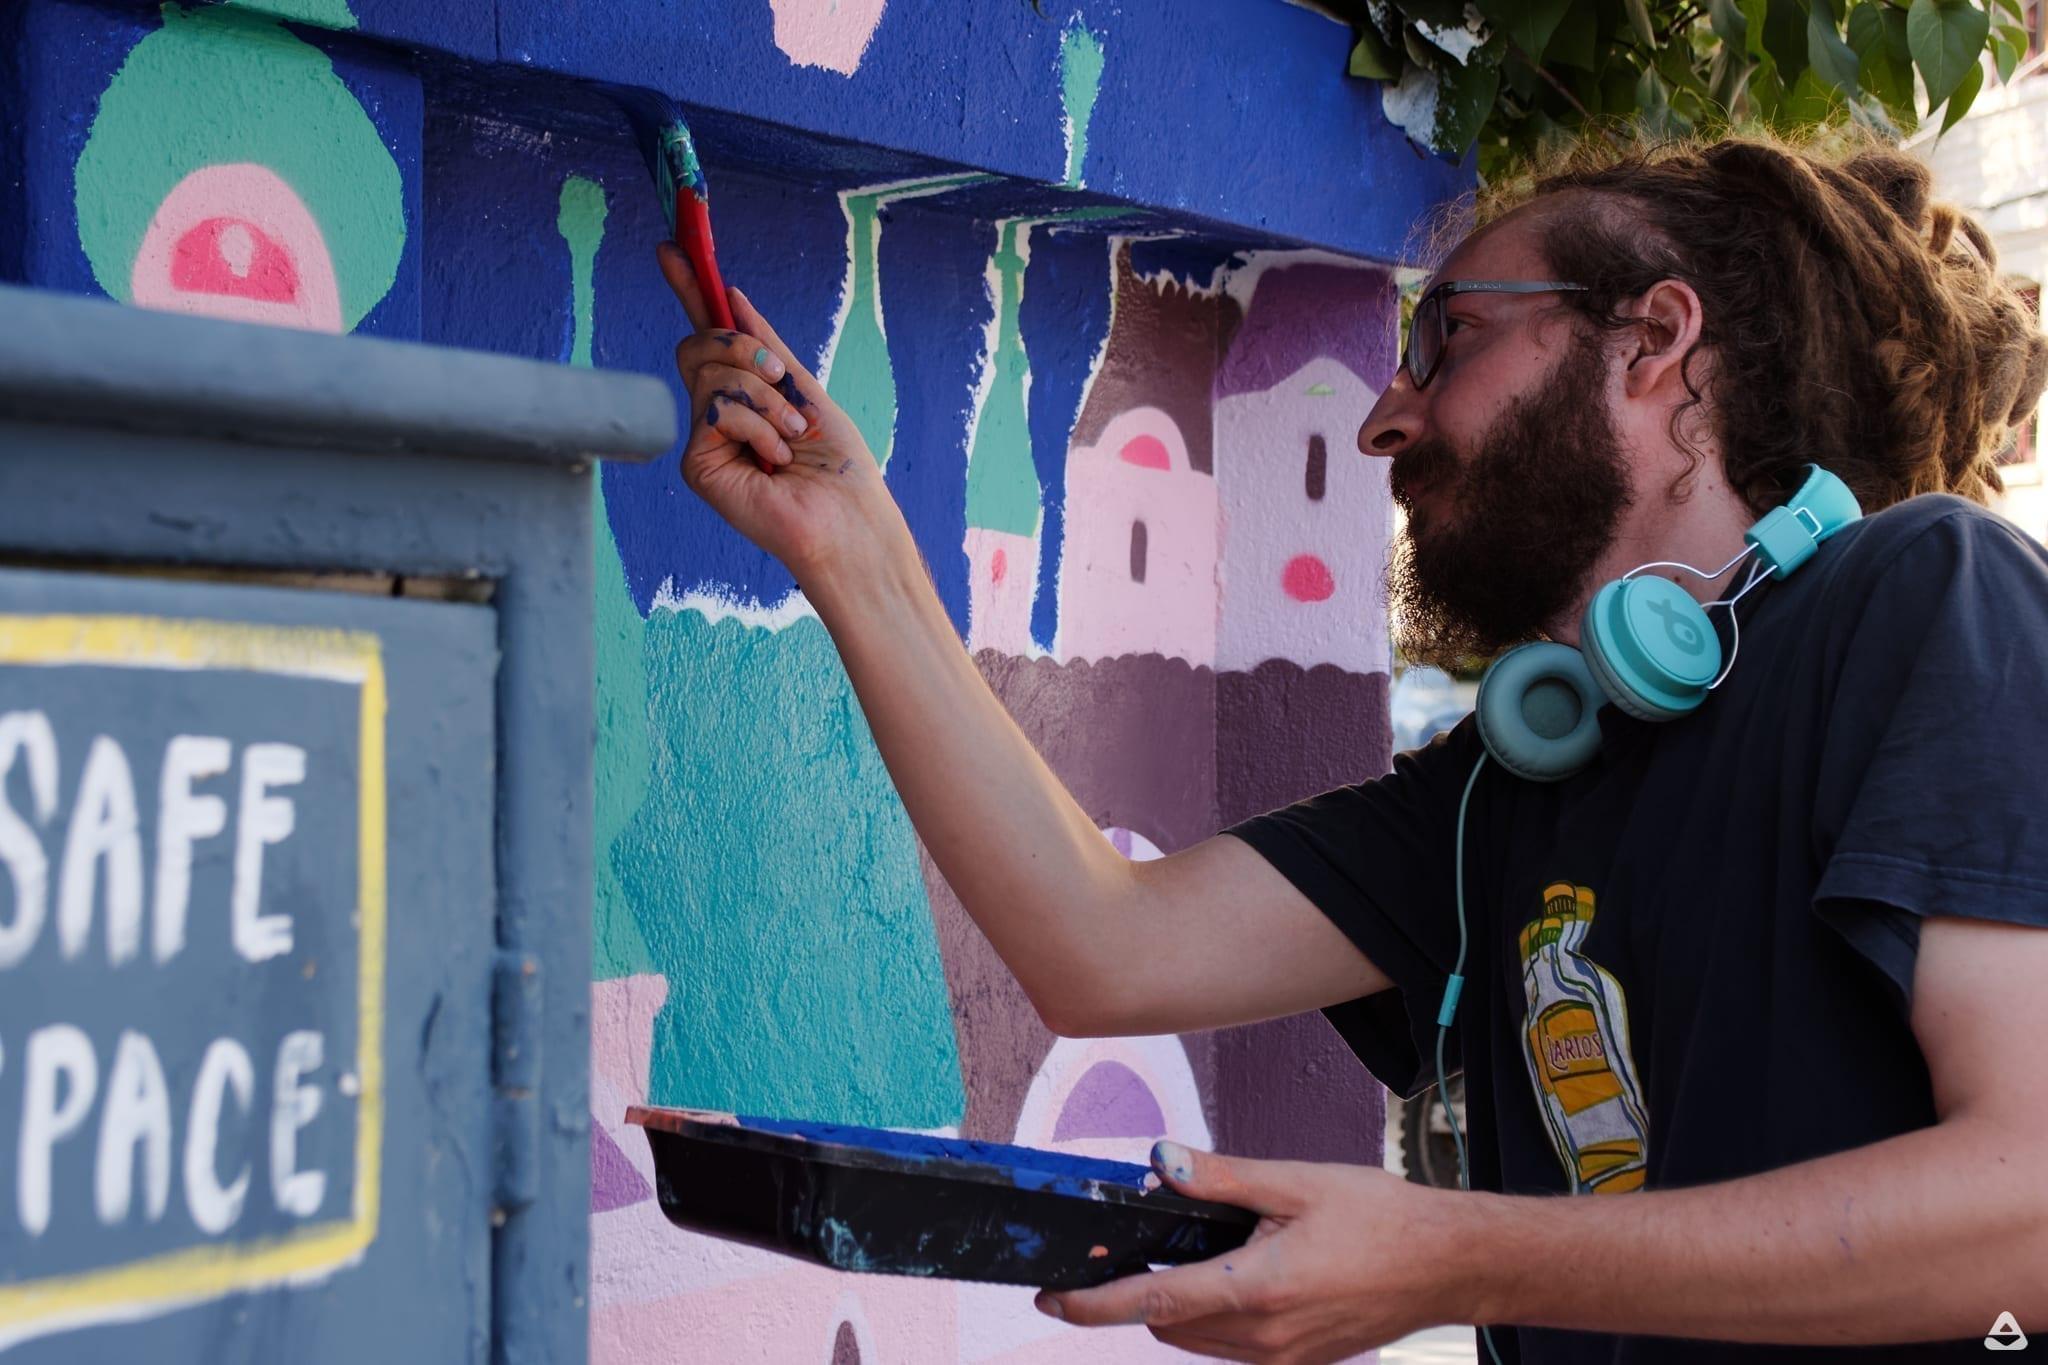 Lucian Niță – KSELEQOQYNQYSHY Casele cu ochii închiși Street Delivery Day 2